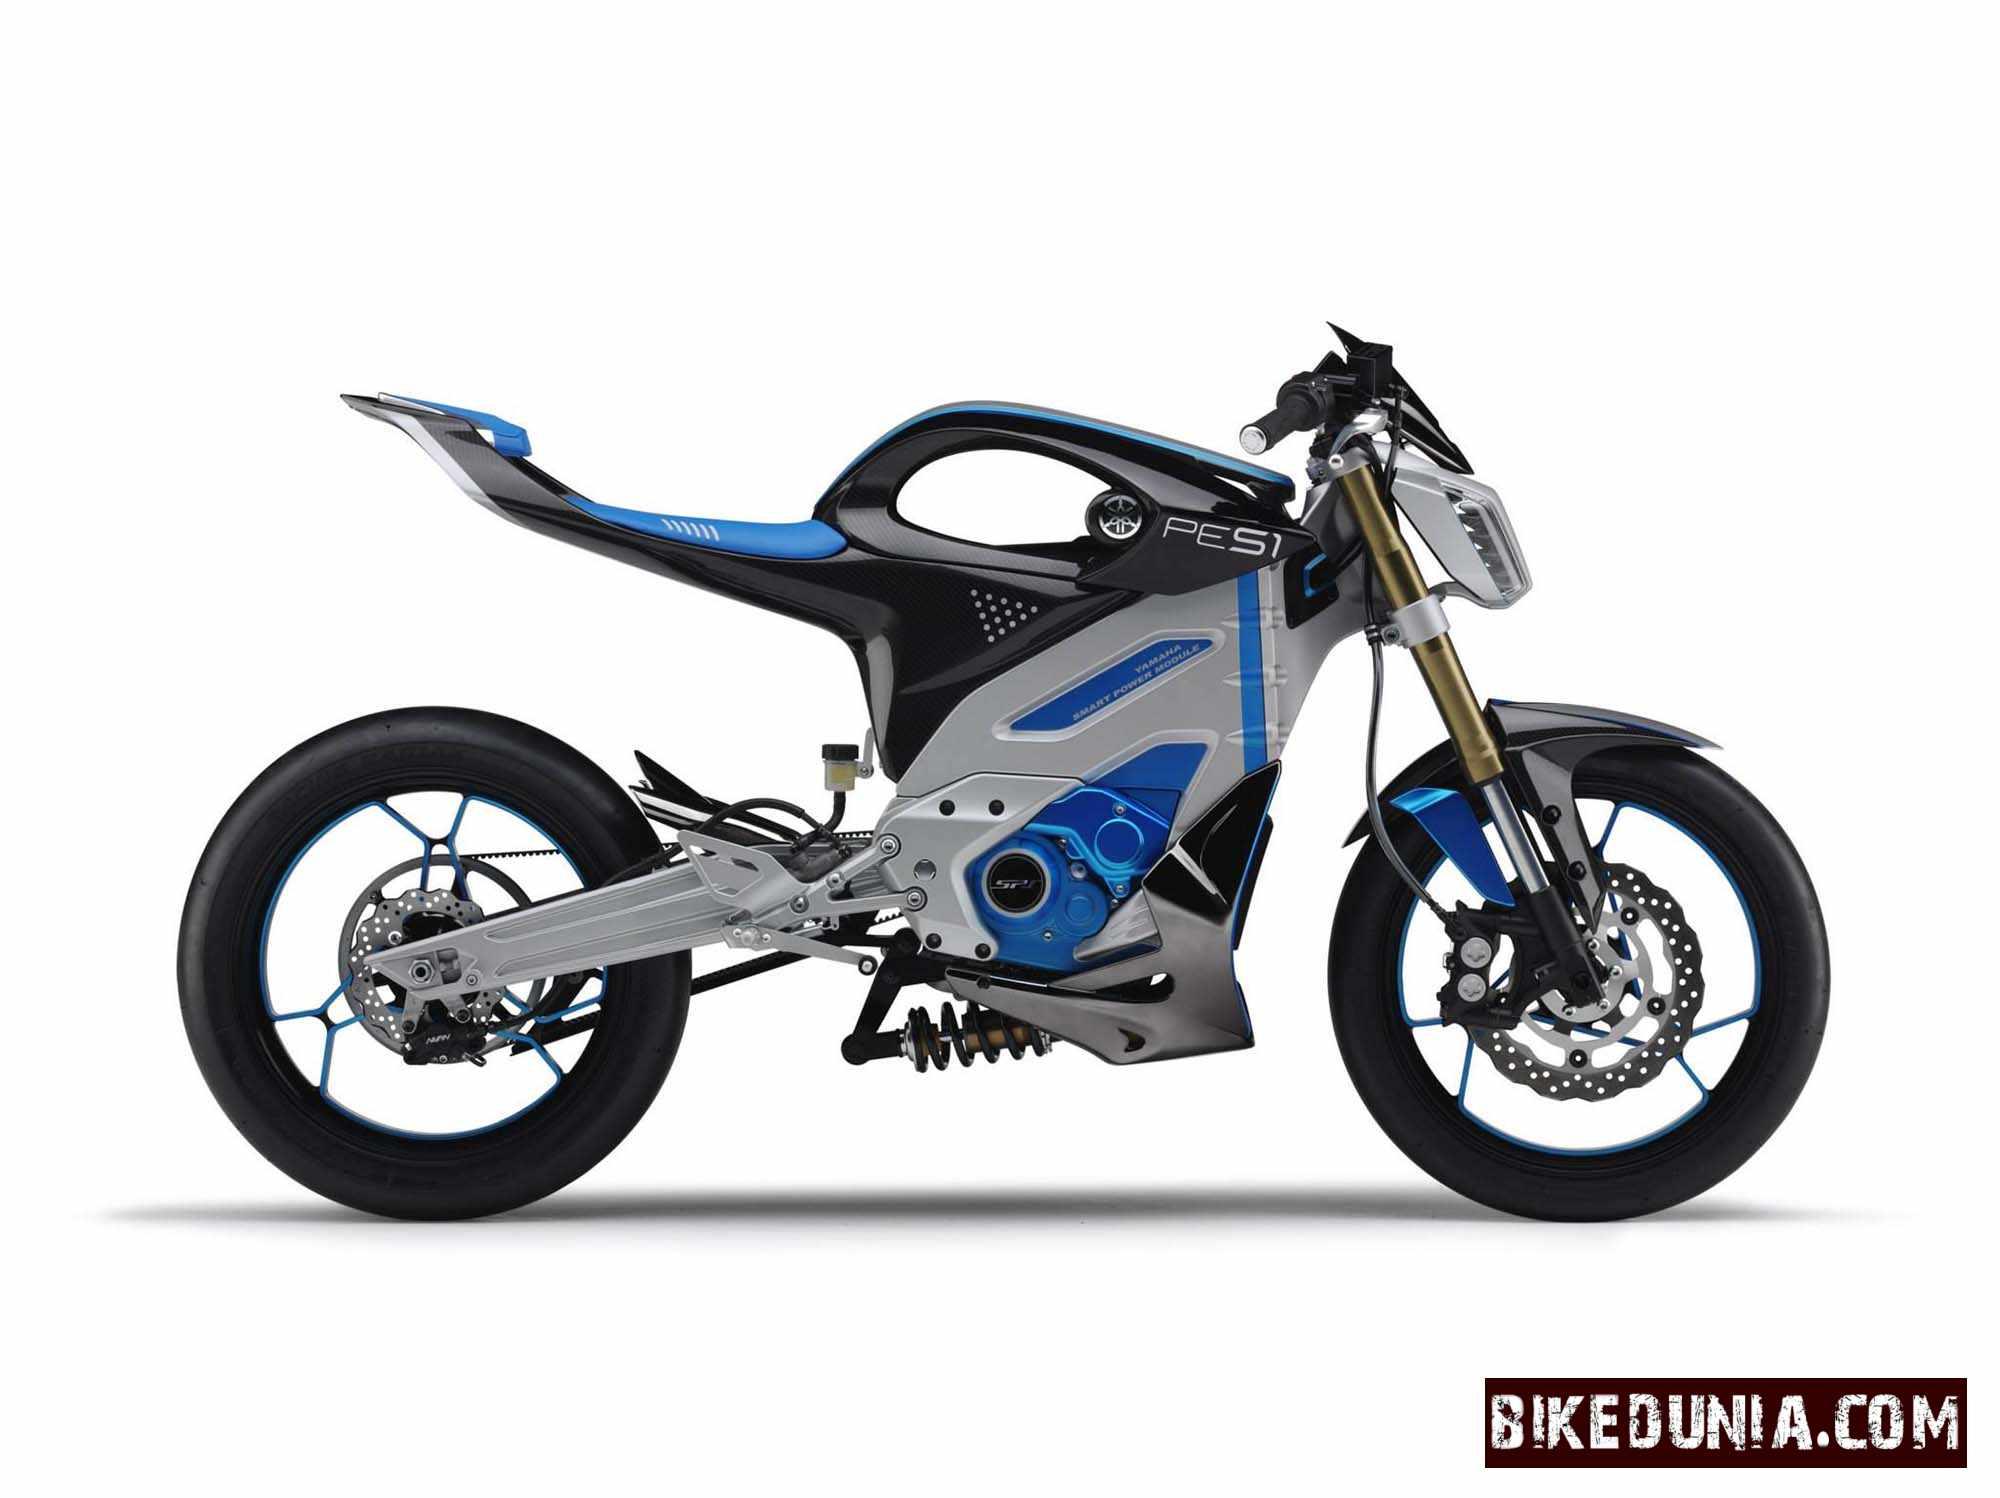 Yamaha compact electric superbike pes1 unveiled bikedunia for Electric yamaha motorcycle